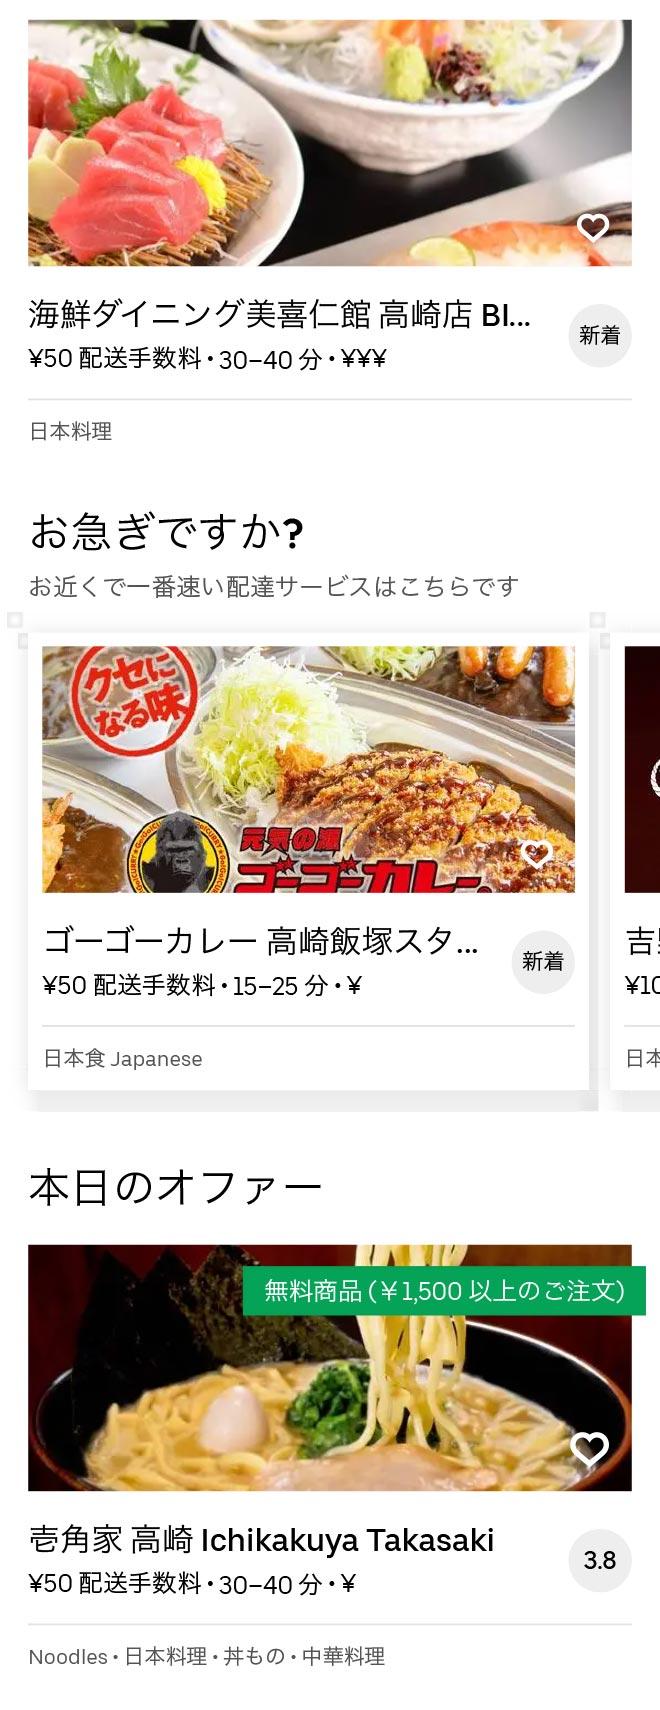 Tonyamachi menu 2010 02